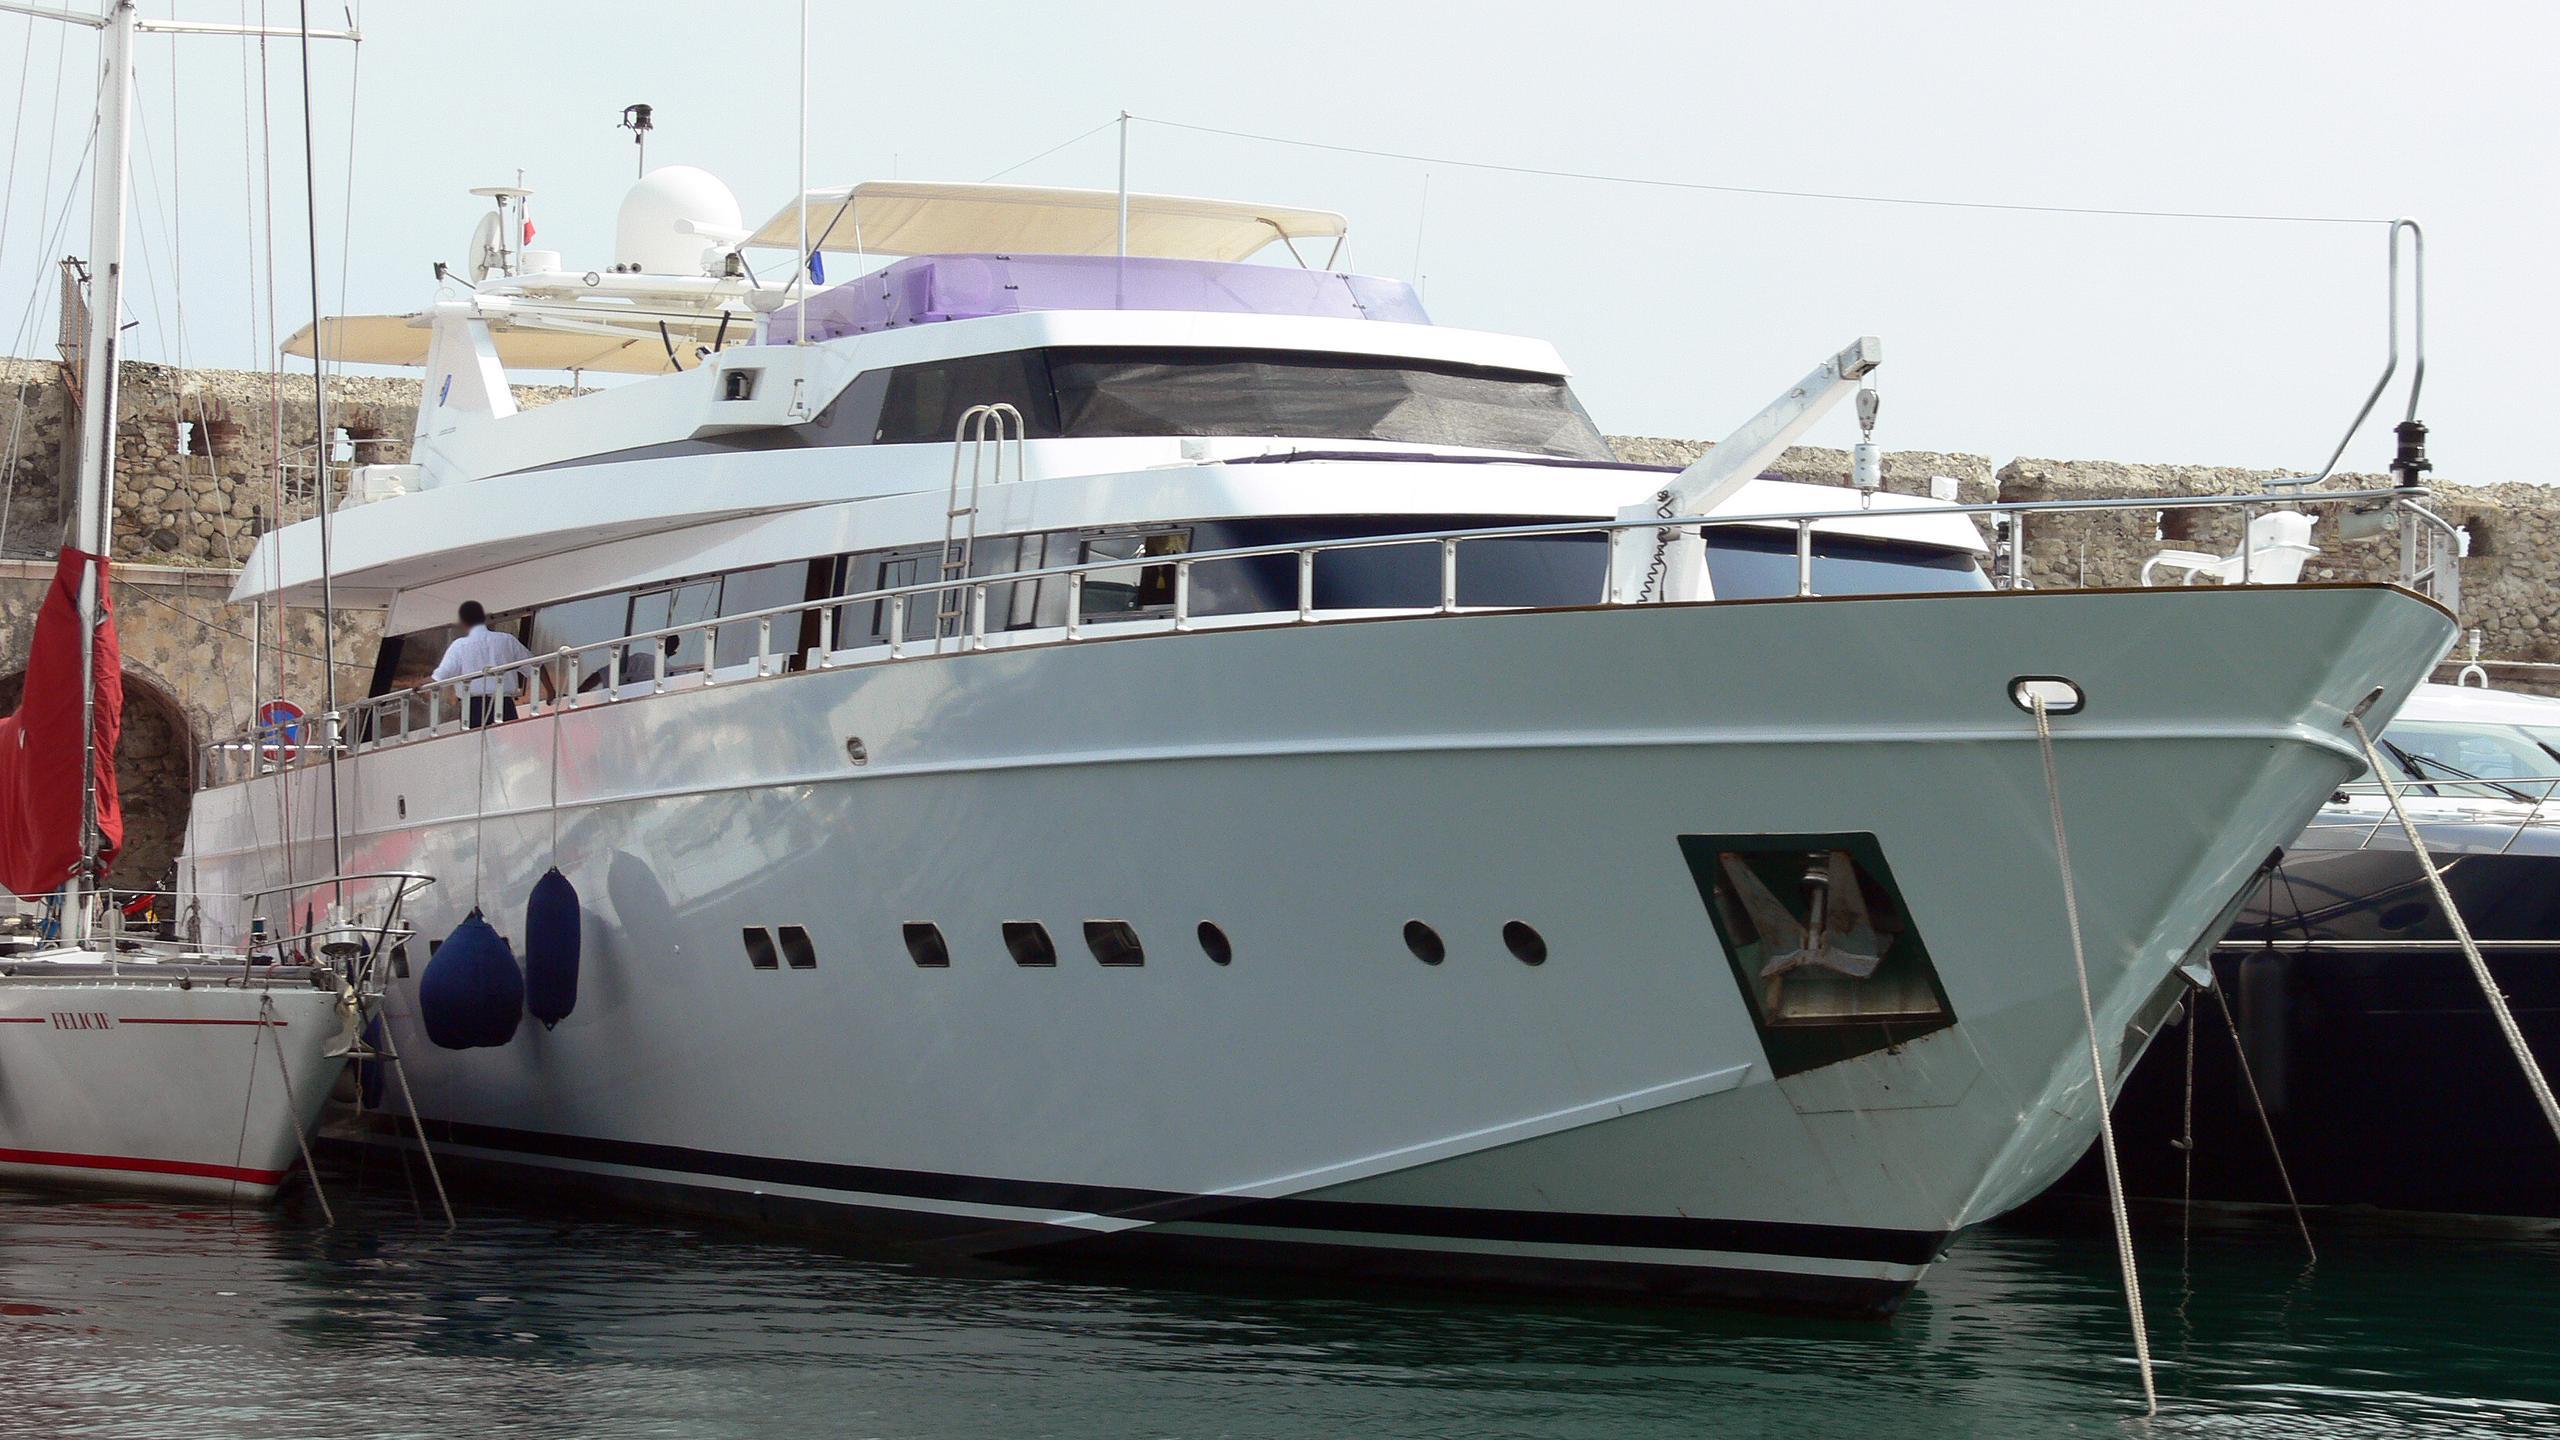 samoras-dandy-motor-yacht-cantieri-di-pisa-akhir-32-1988-33m-bow